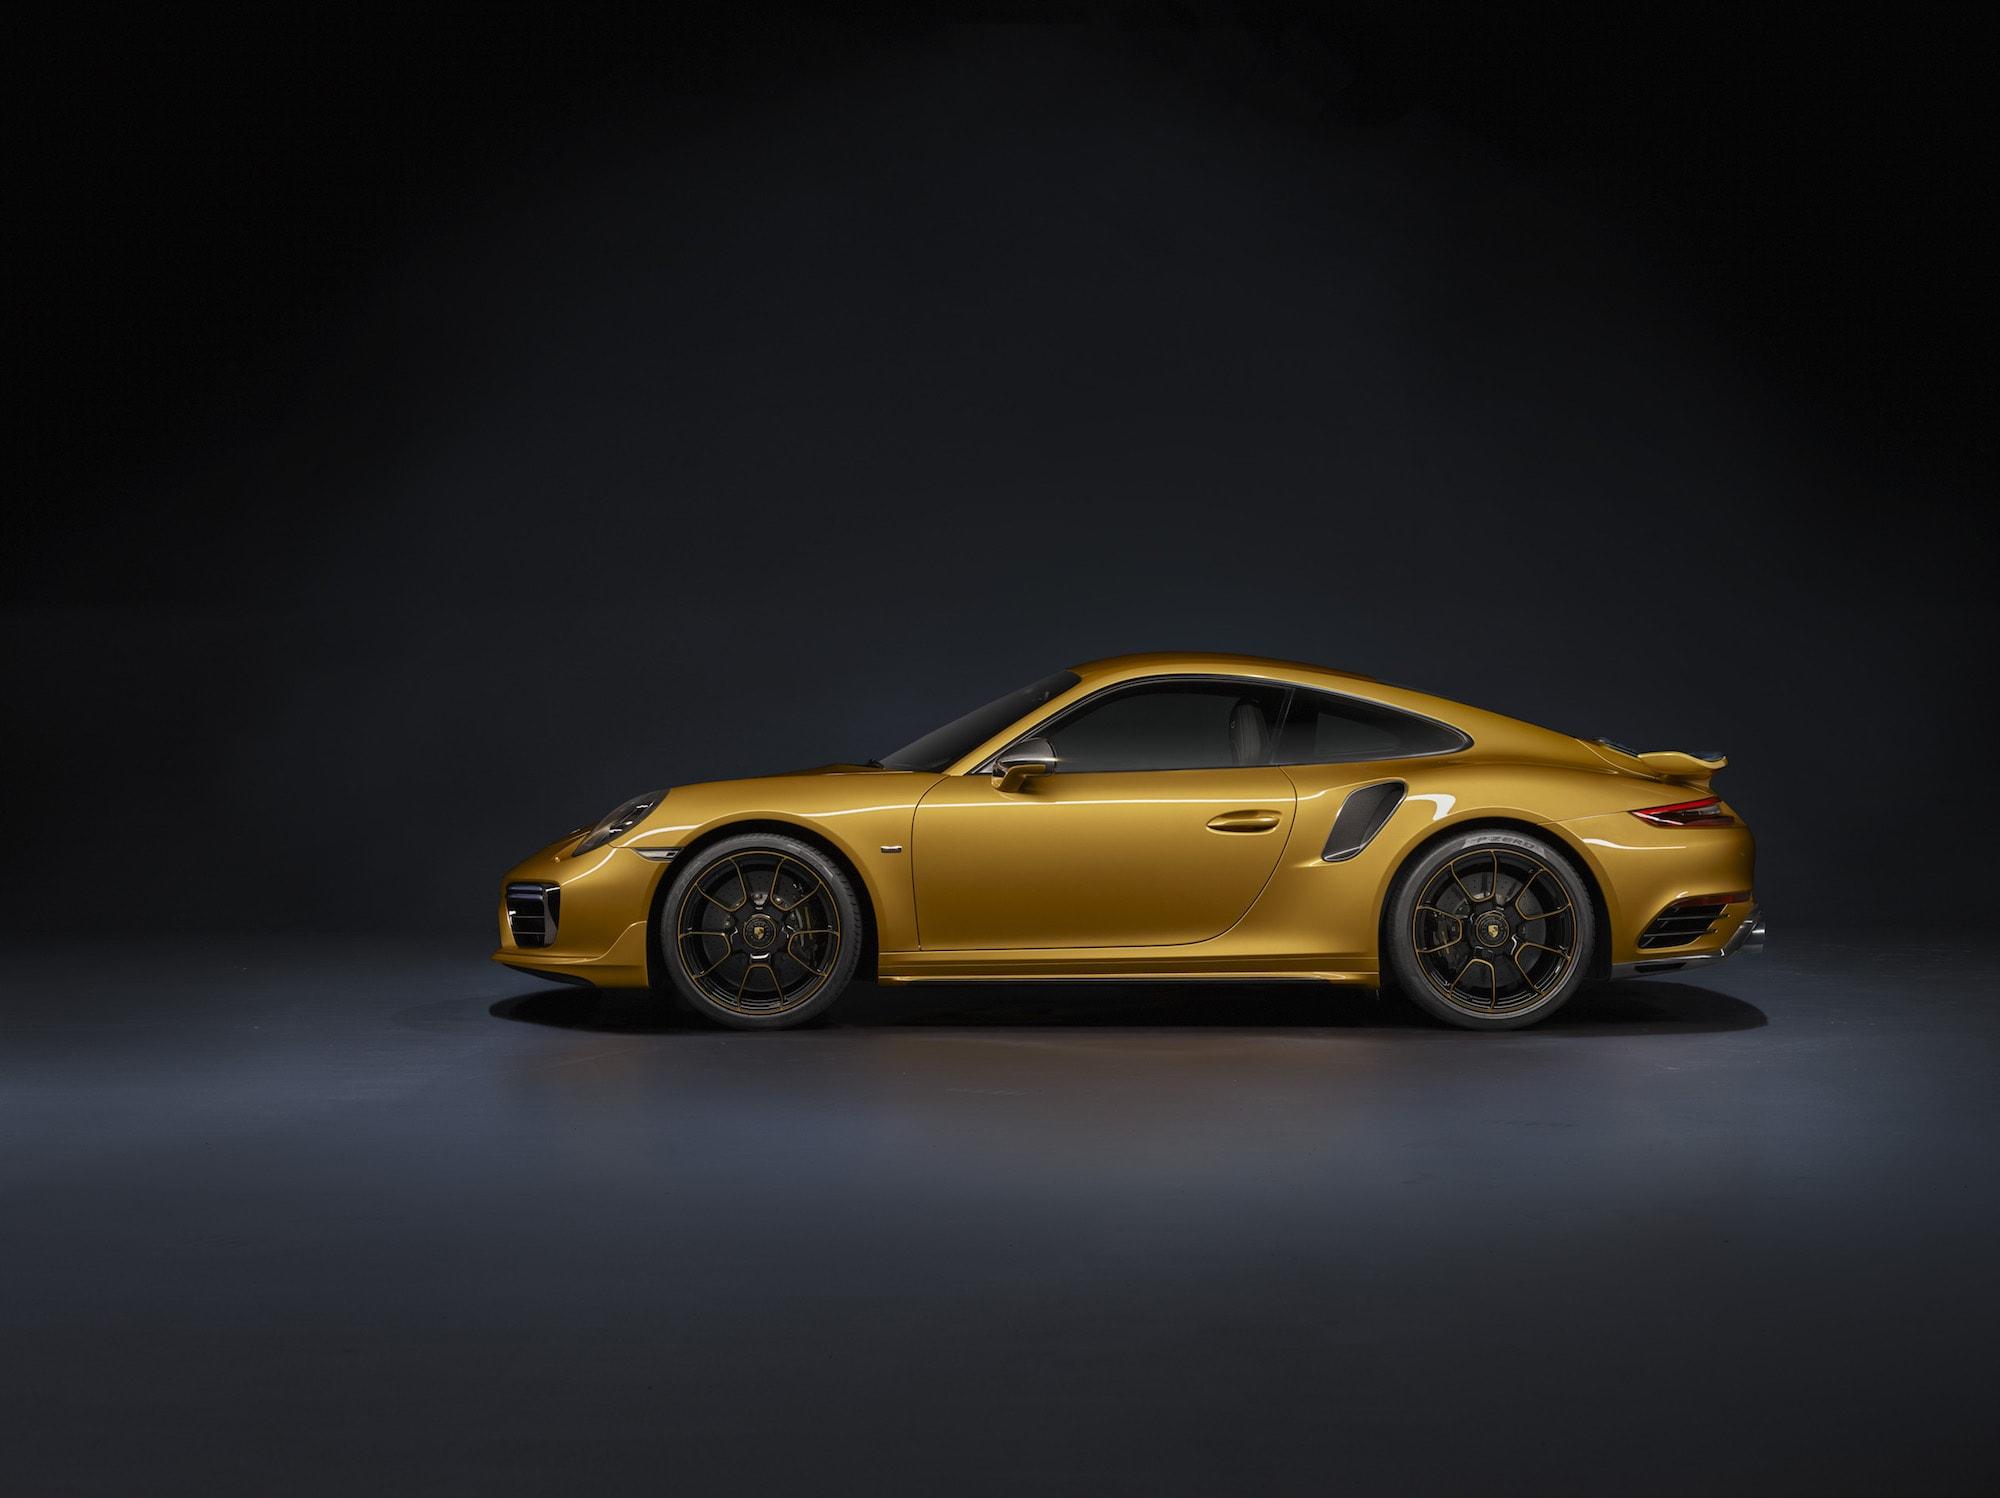 Echt goldig: Der Neue 911 Turbo S Exclusive Series 2